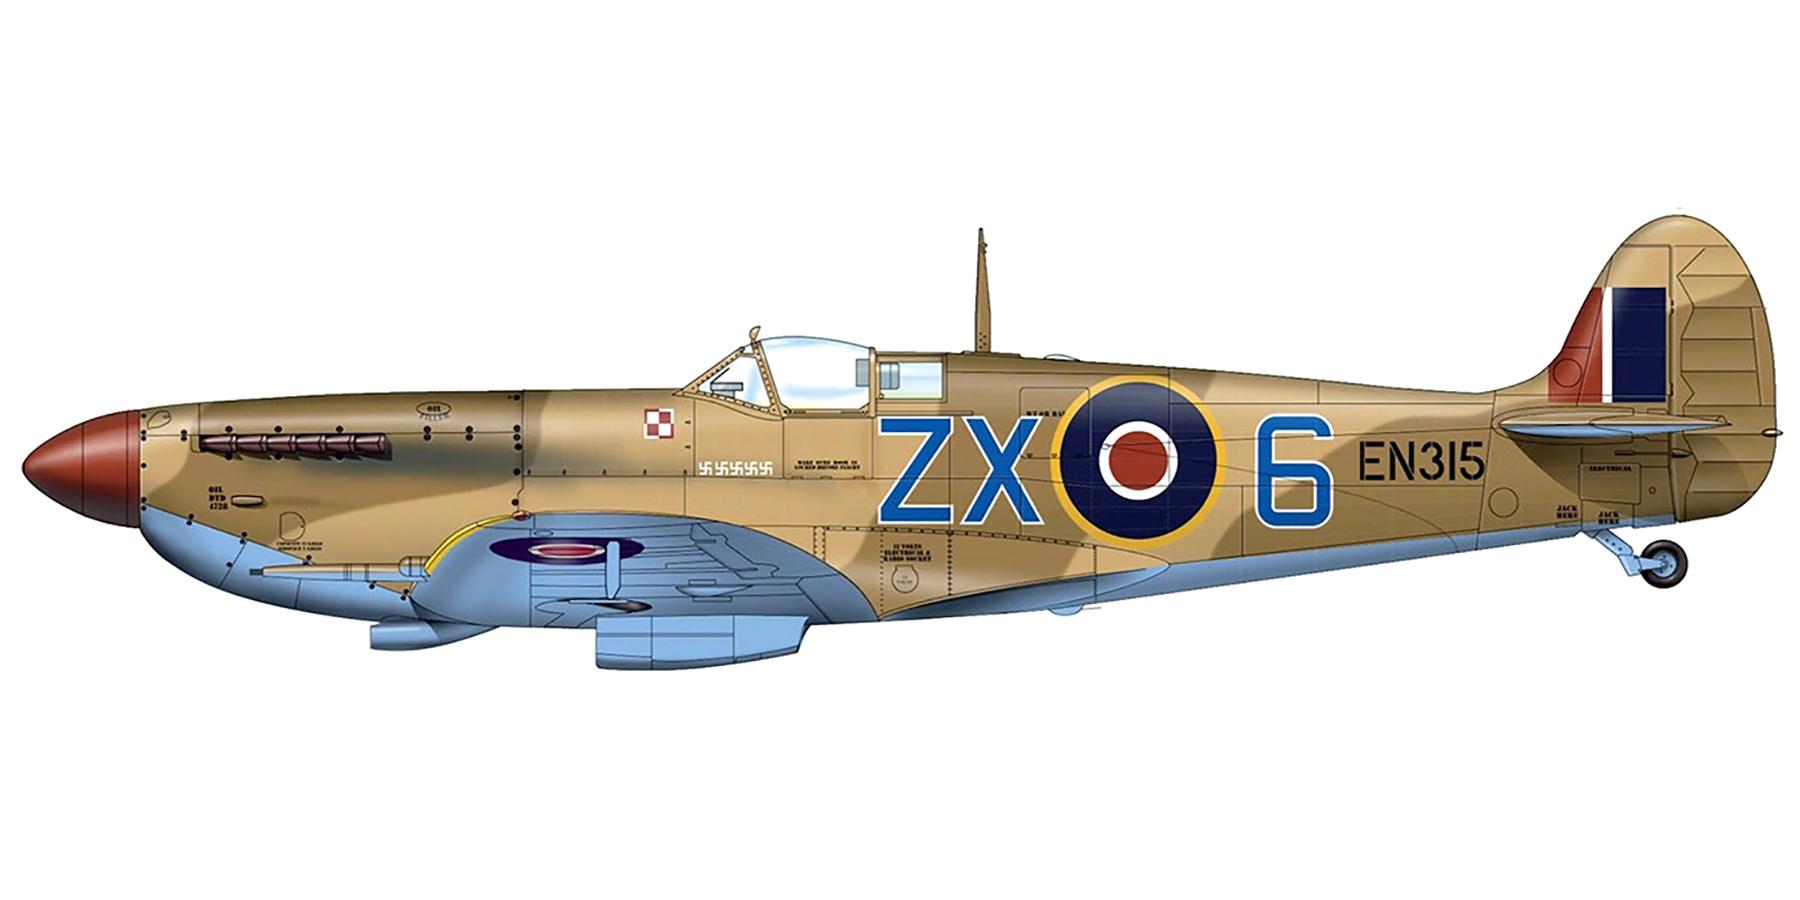 Spitfire MkIXc RAF 145Sqn ZX6 EN315 Stanislaw Skalski at Tunisia Apr 1943 0A